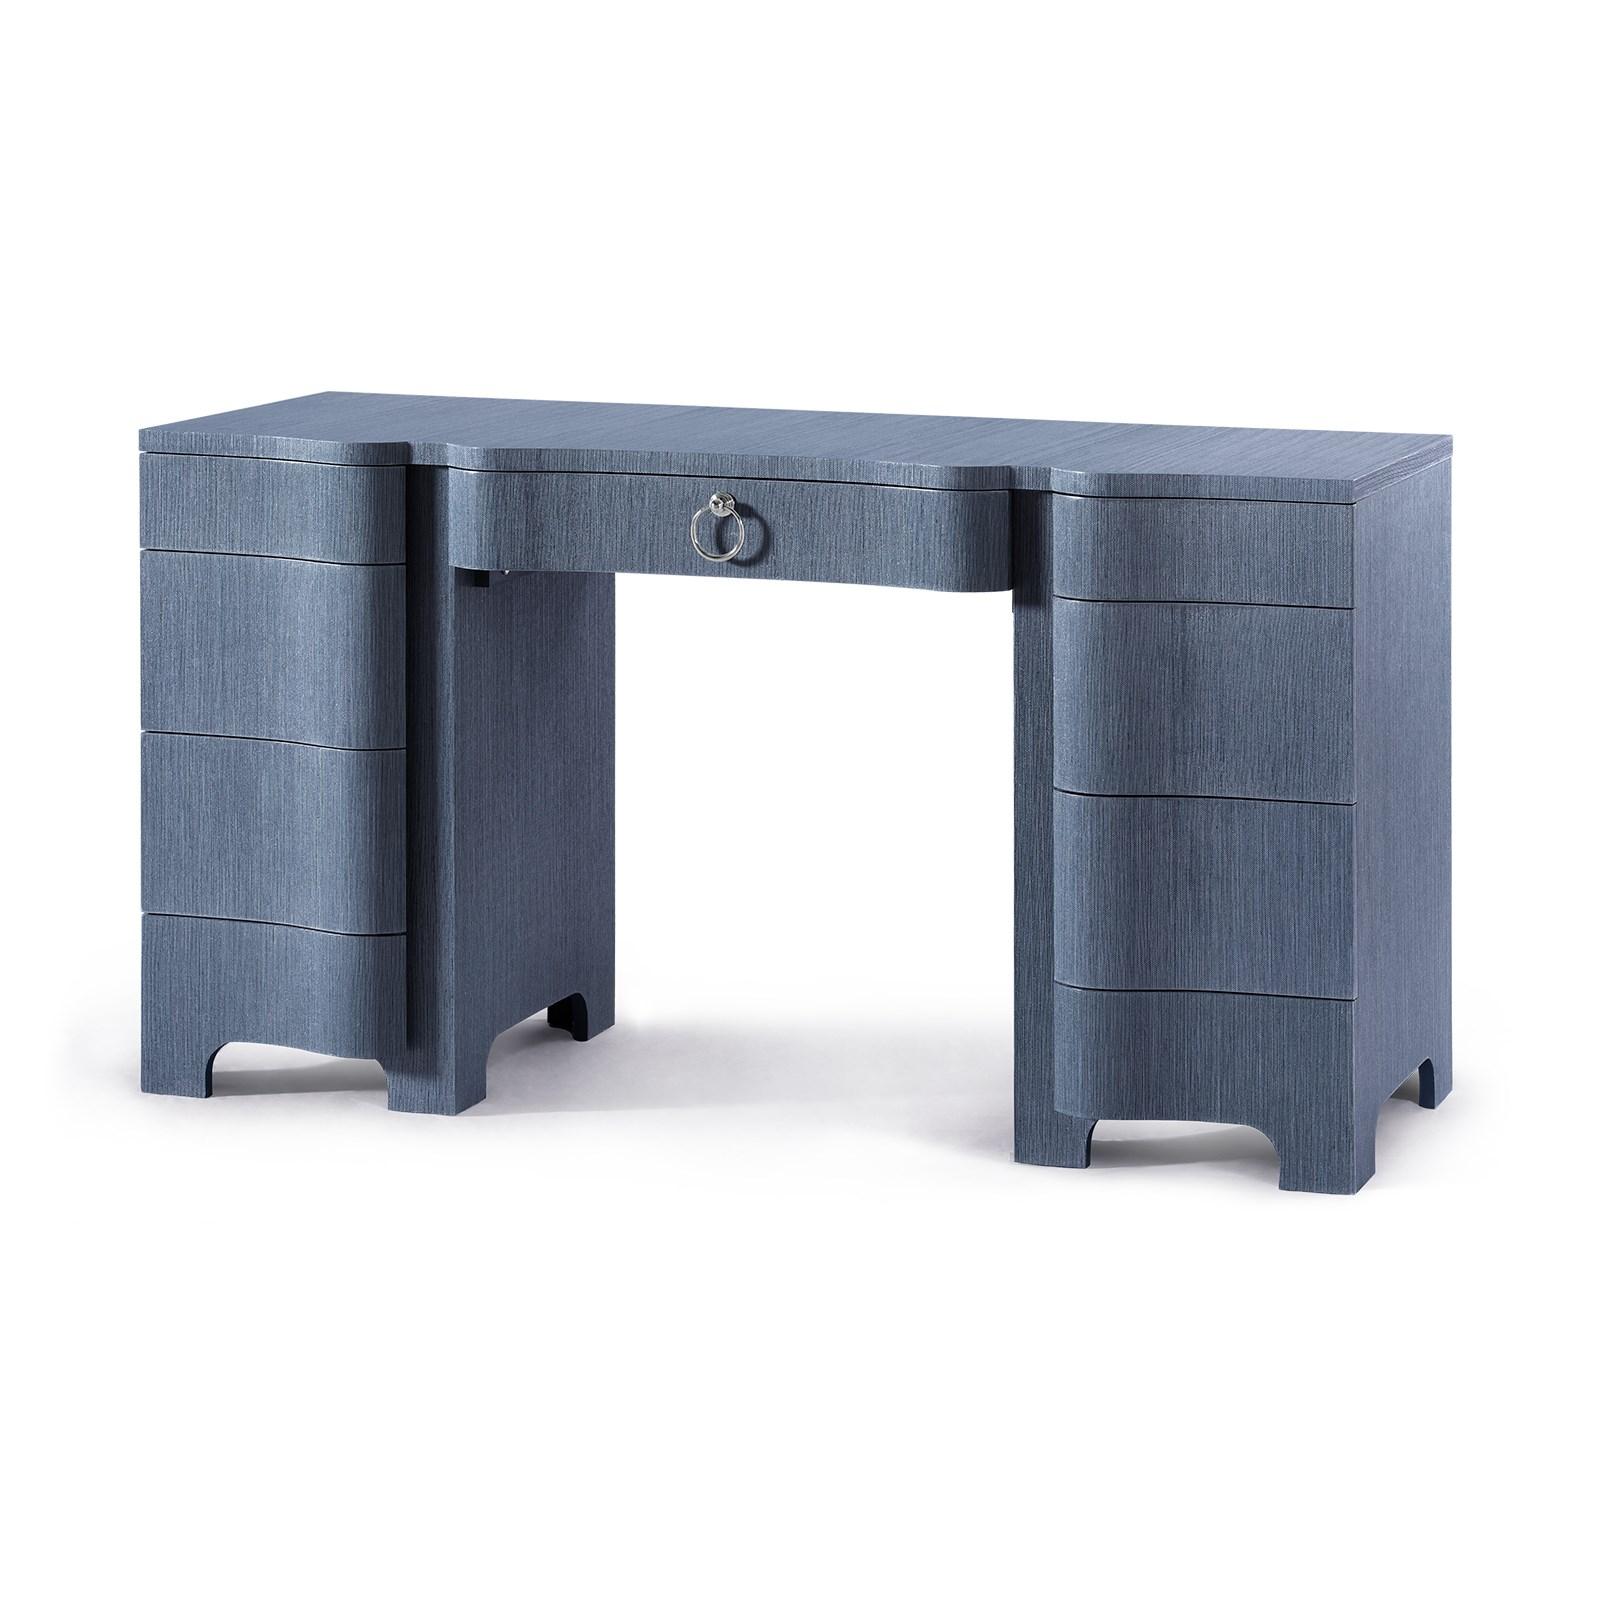 quality desks ergonomic kids chacha desk chairs best blue study children chair school shop